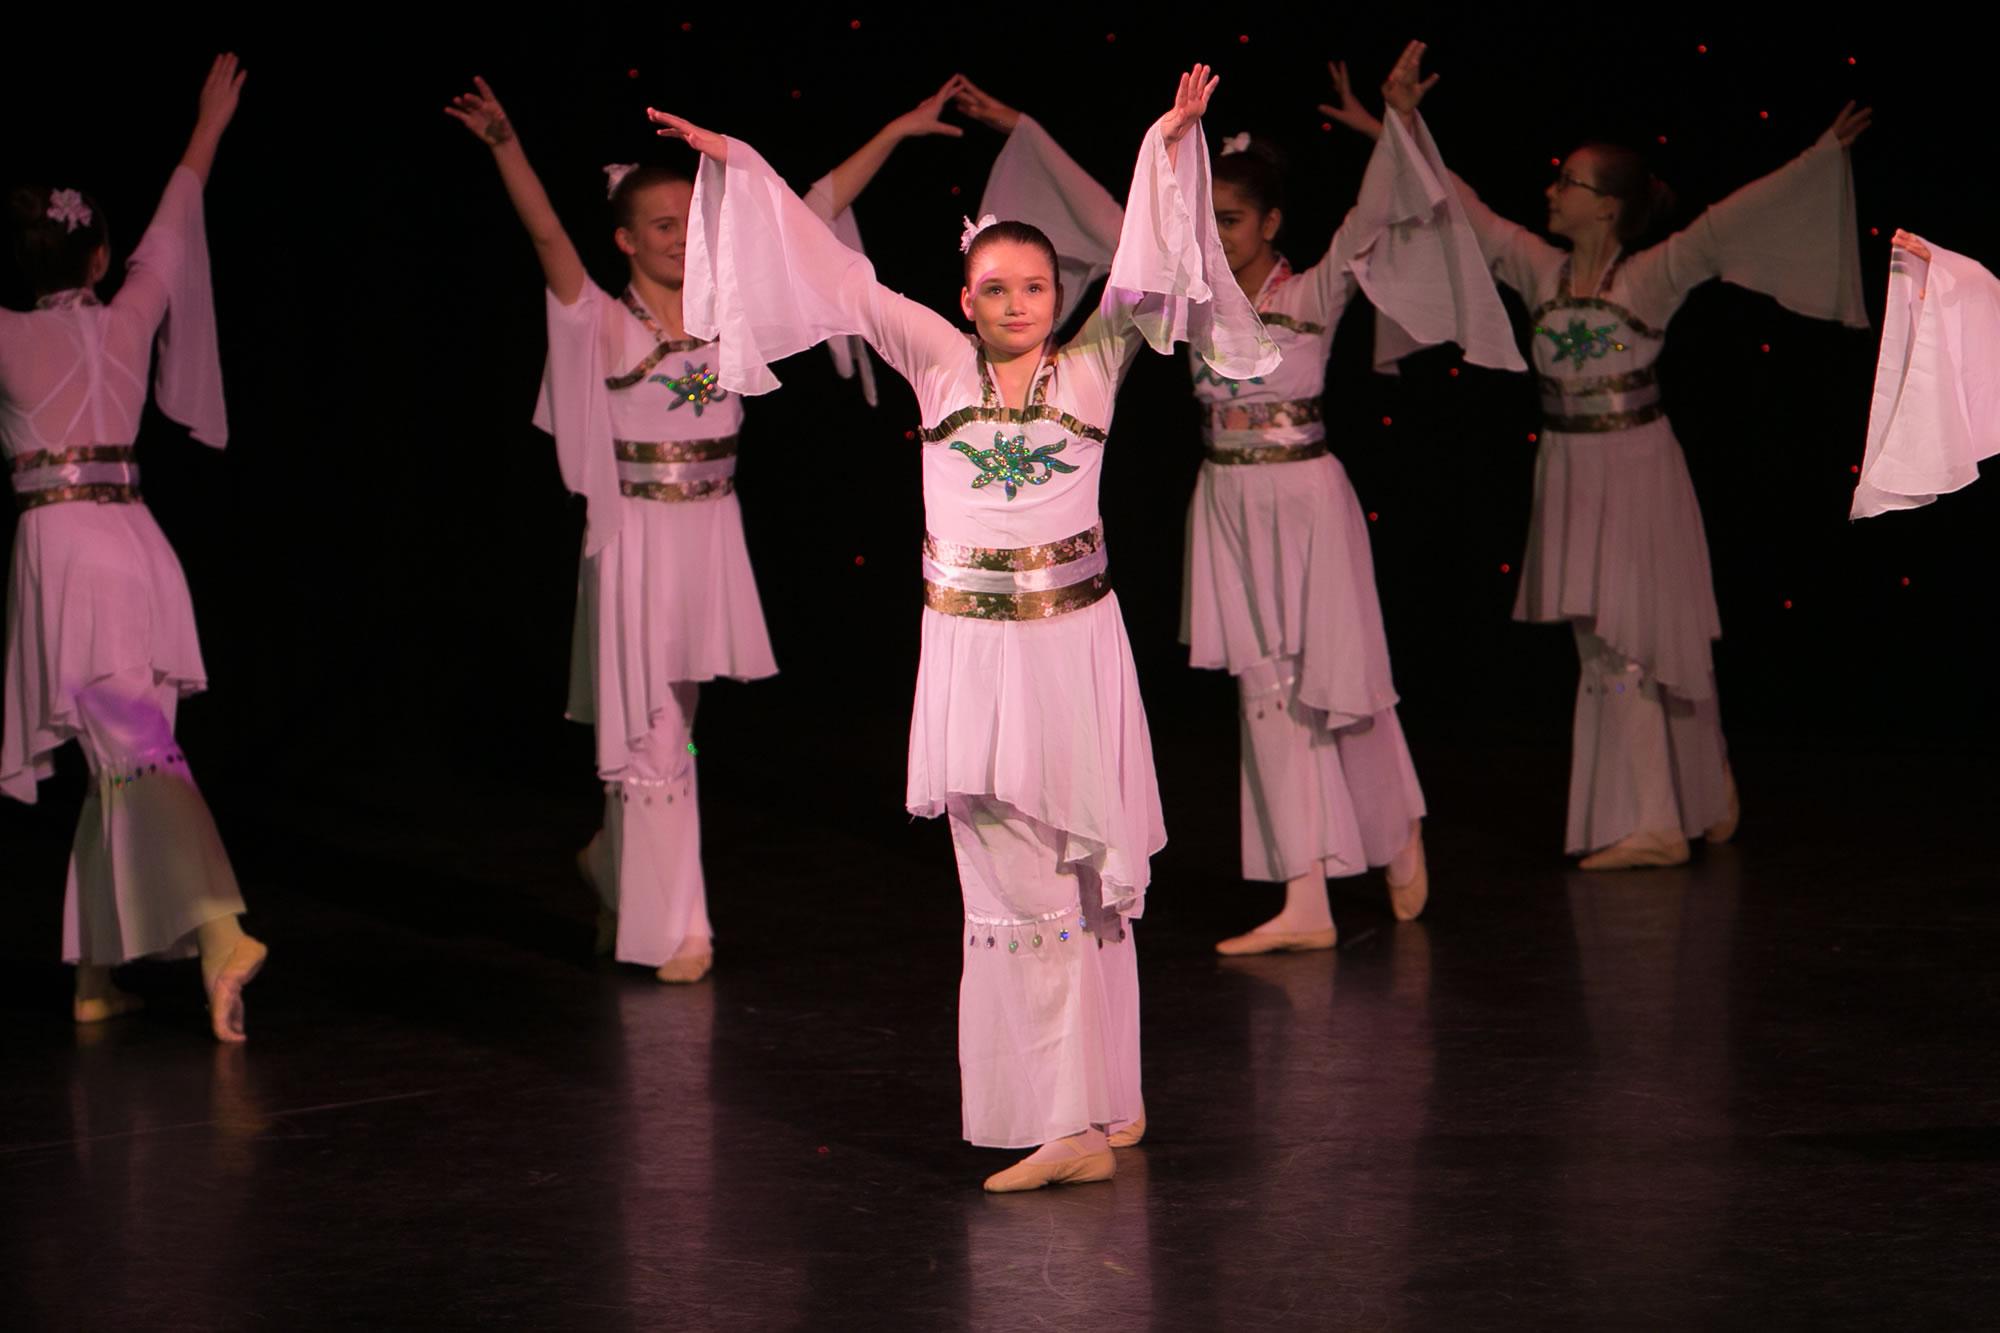 Hitchin_School_of_Dance_Show_2019-SM1_2487.jpg